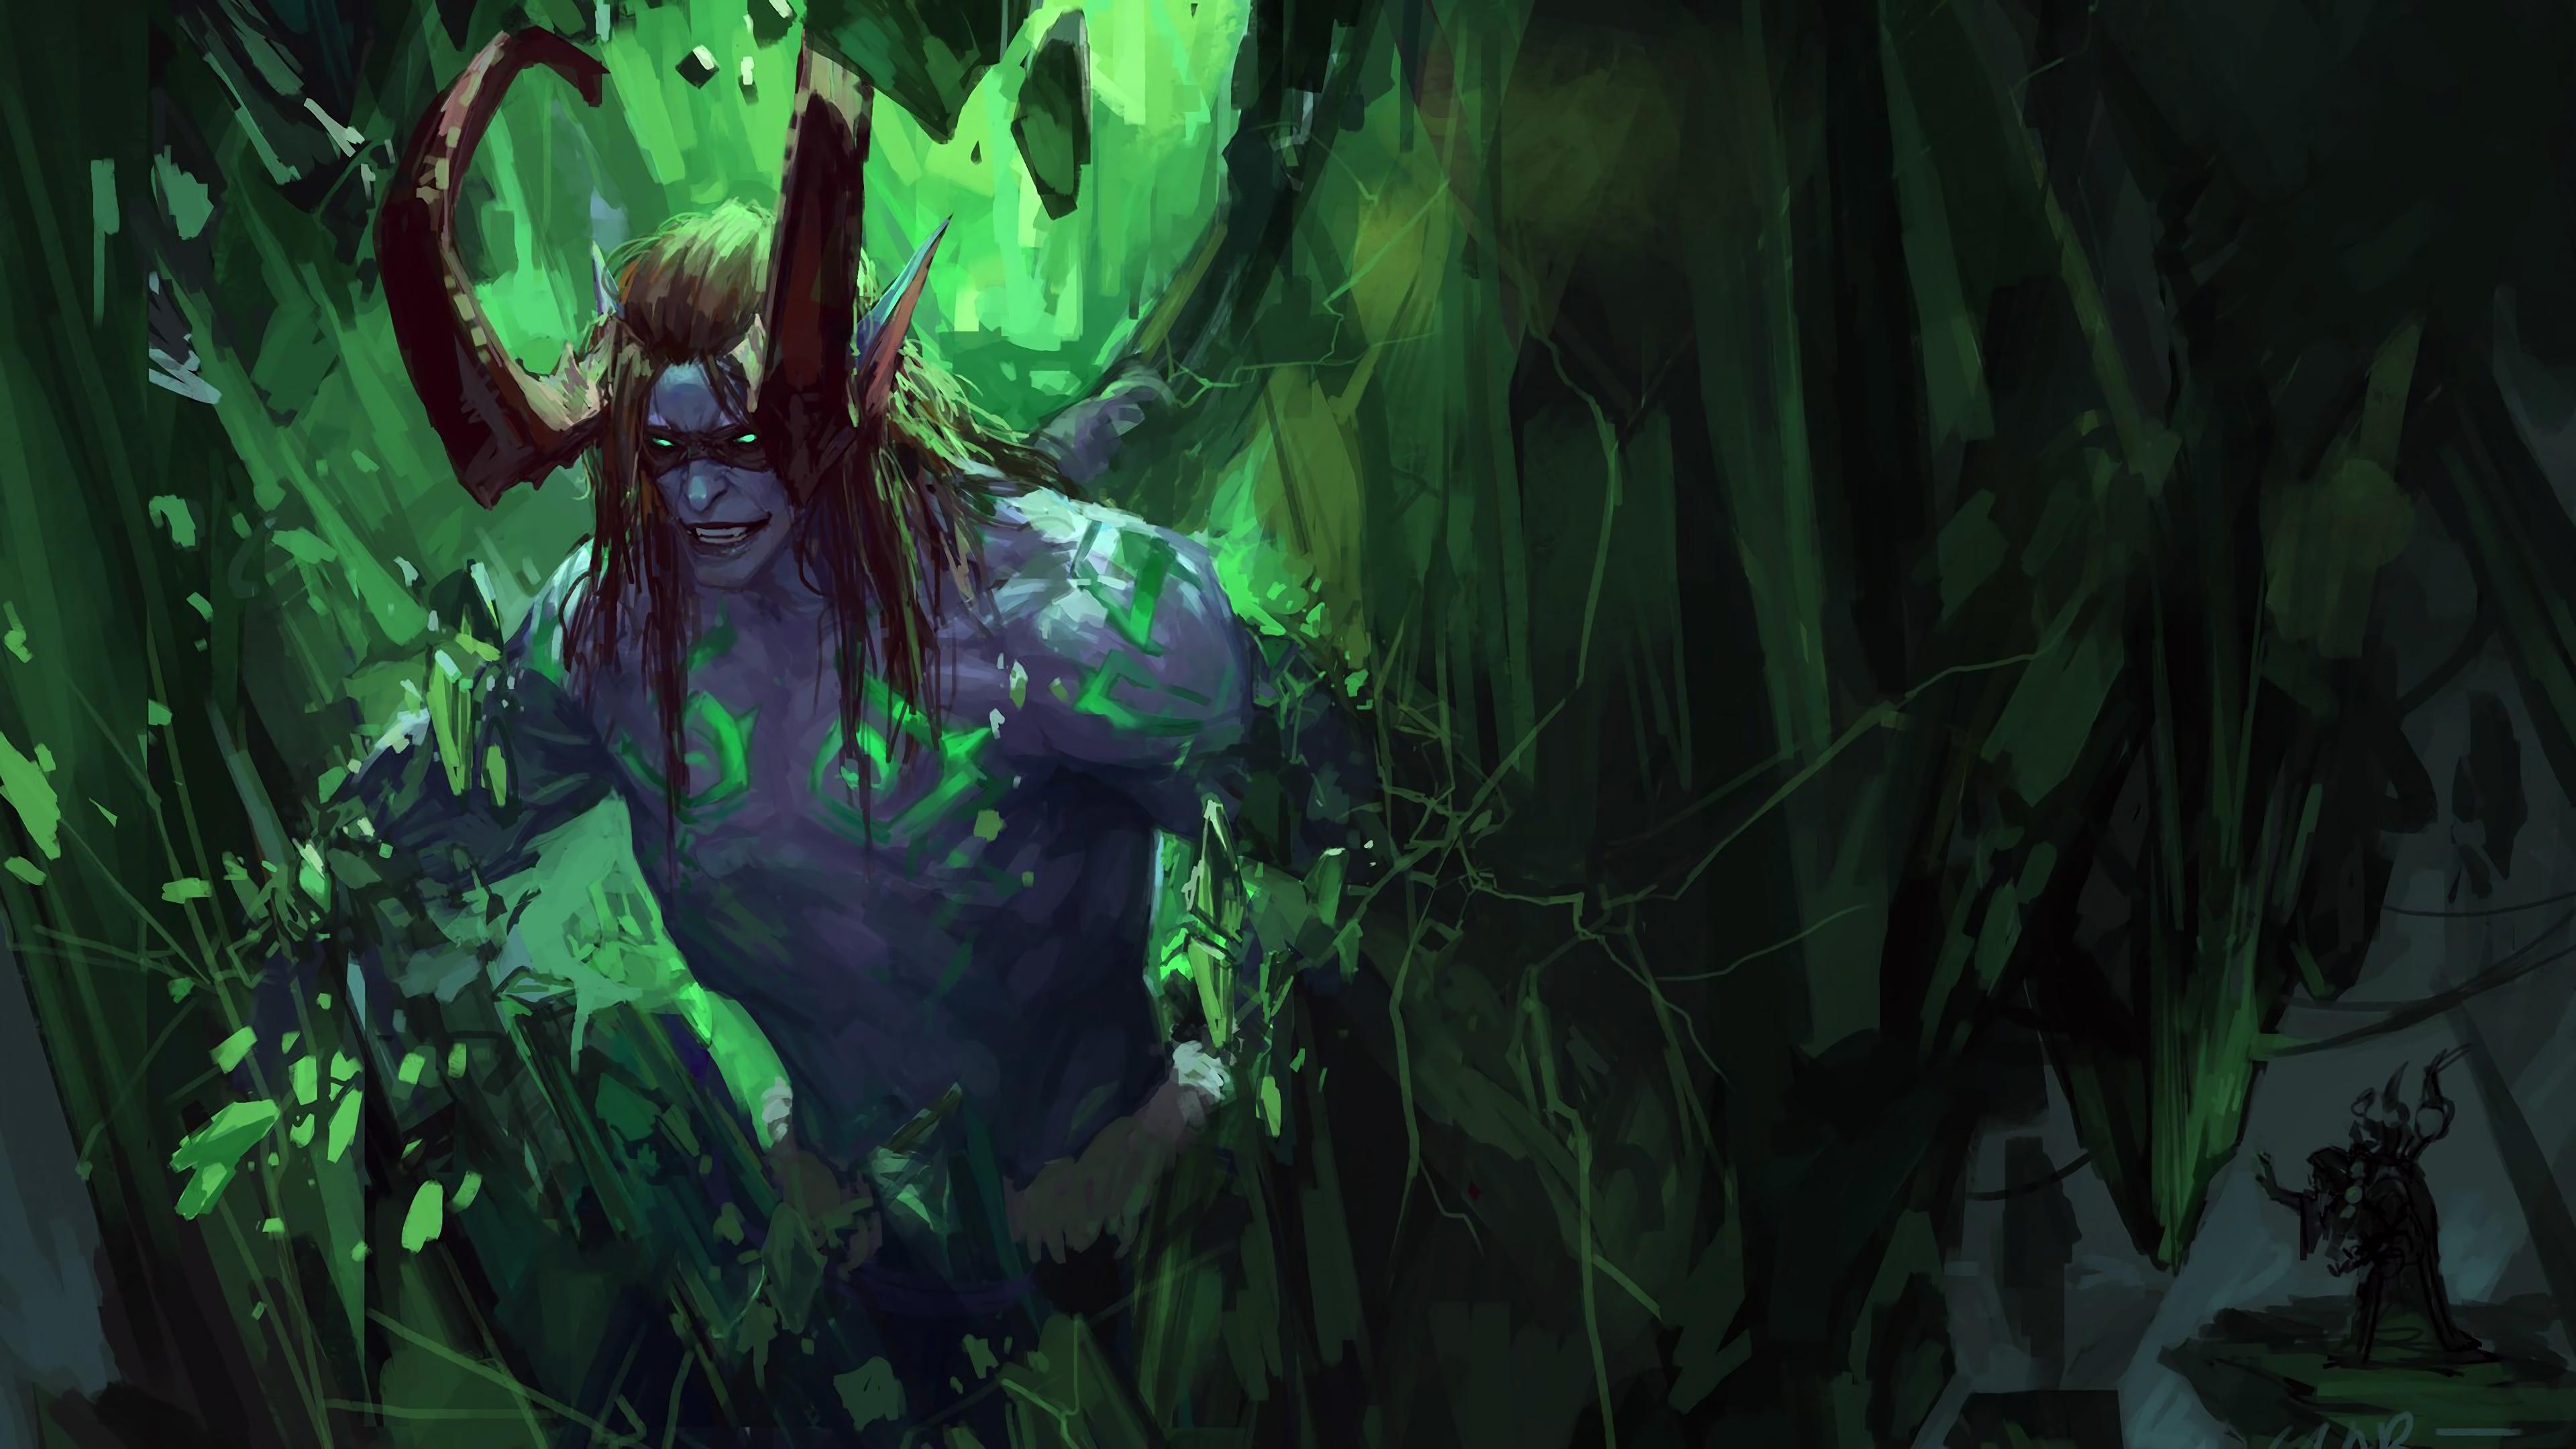 World Of Warcraft WoW 4K 8K HD Wallpaper 6